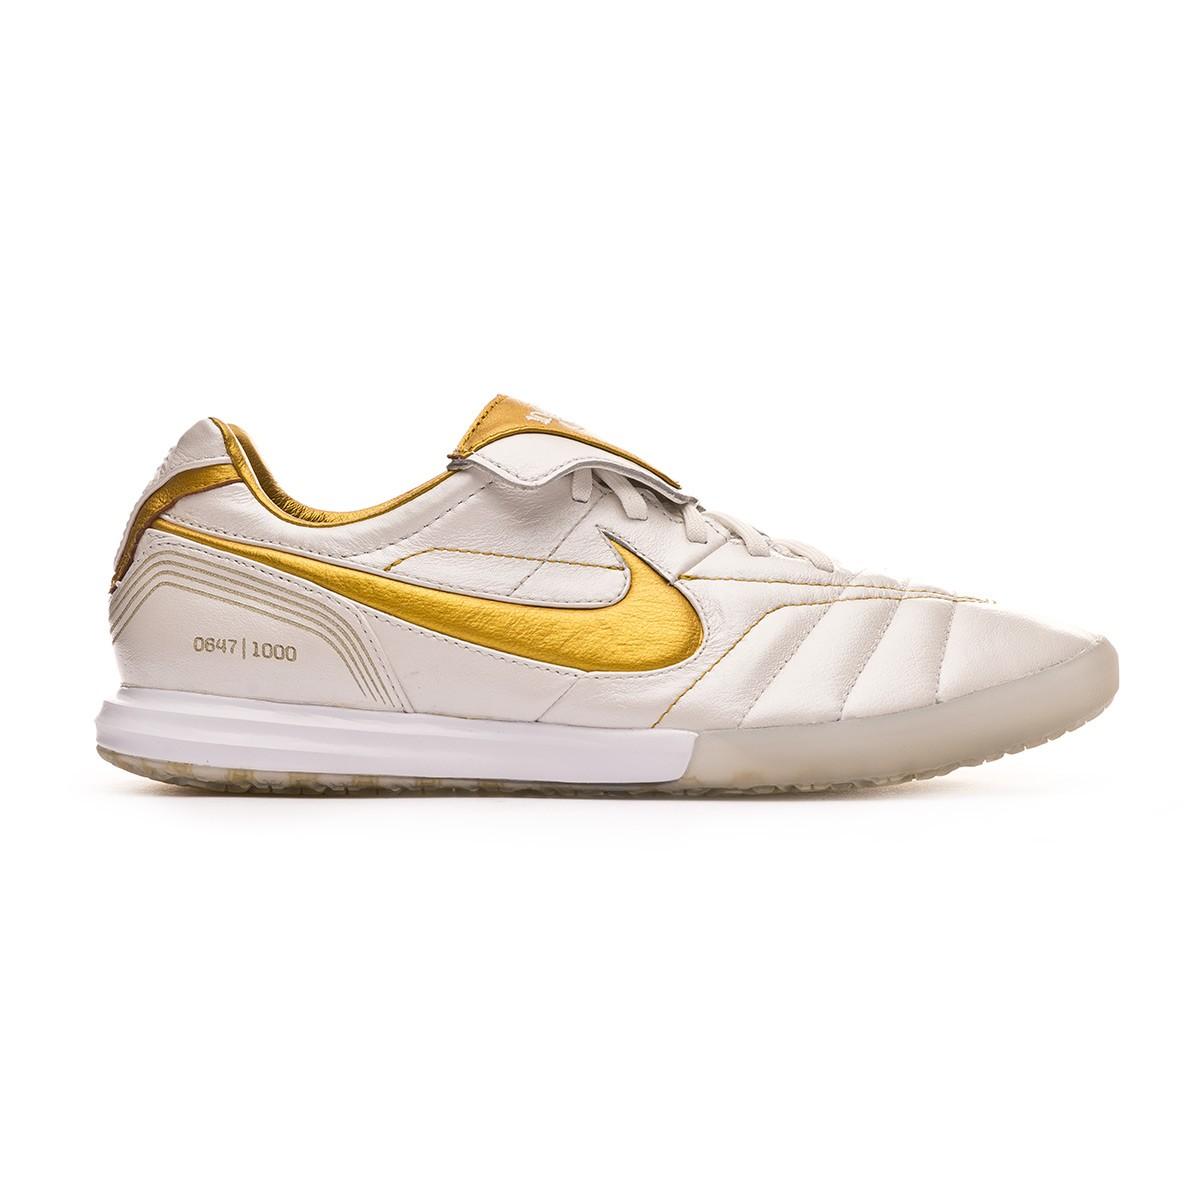 214b6a0c5 Futsal Boot Nike Tiempo Lunar Legend VII Elite 10R IC Metallic  summit-Metallic Gold - Tienda de fútbol Fútbol Emotion